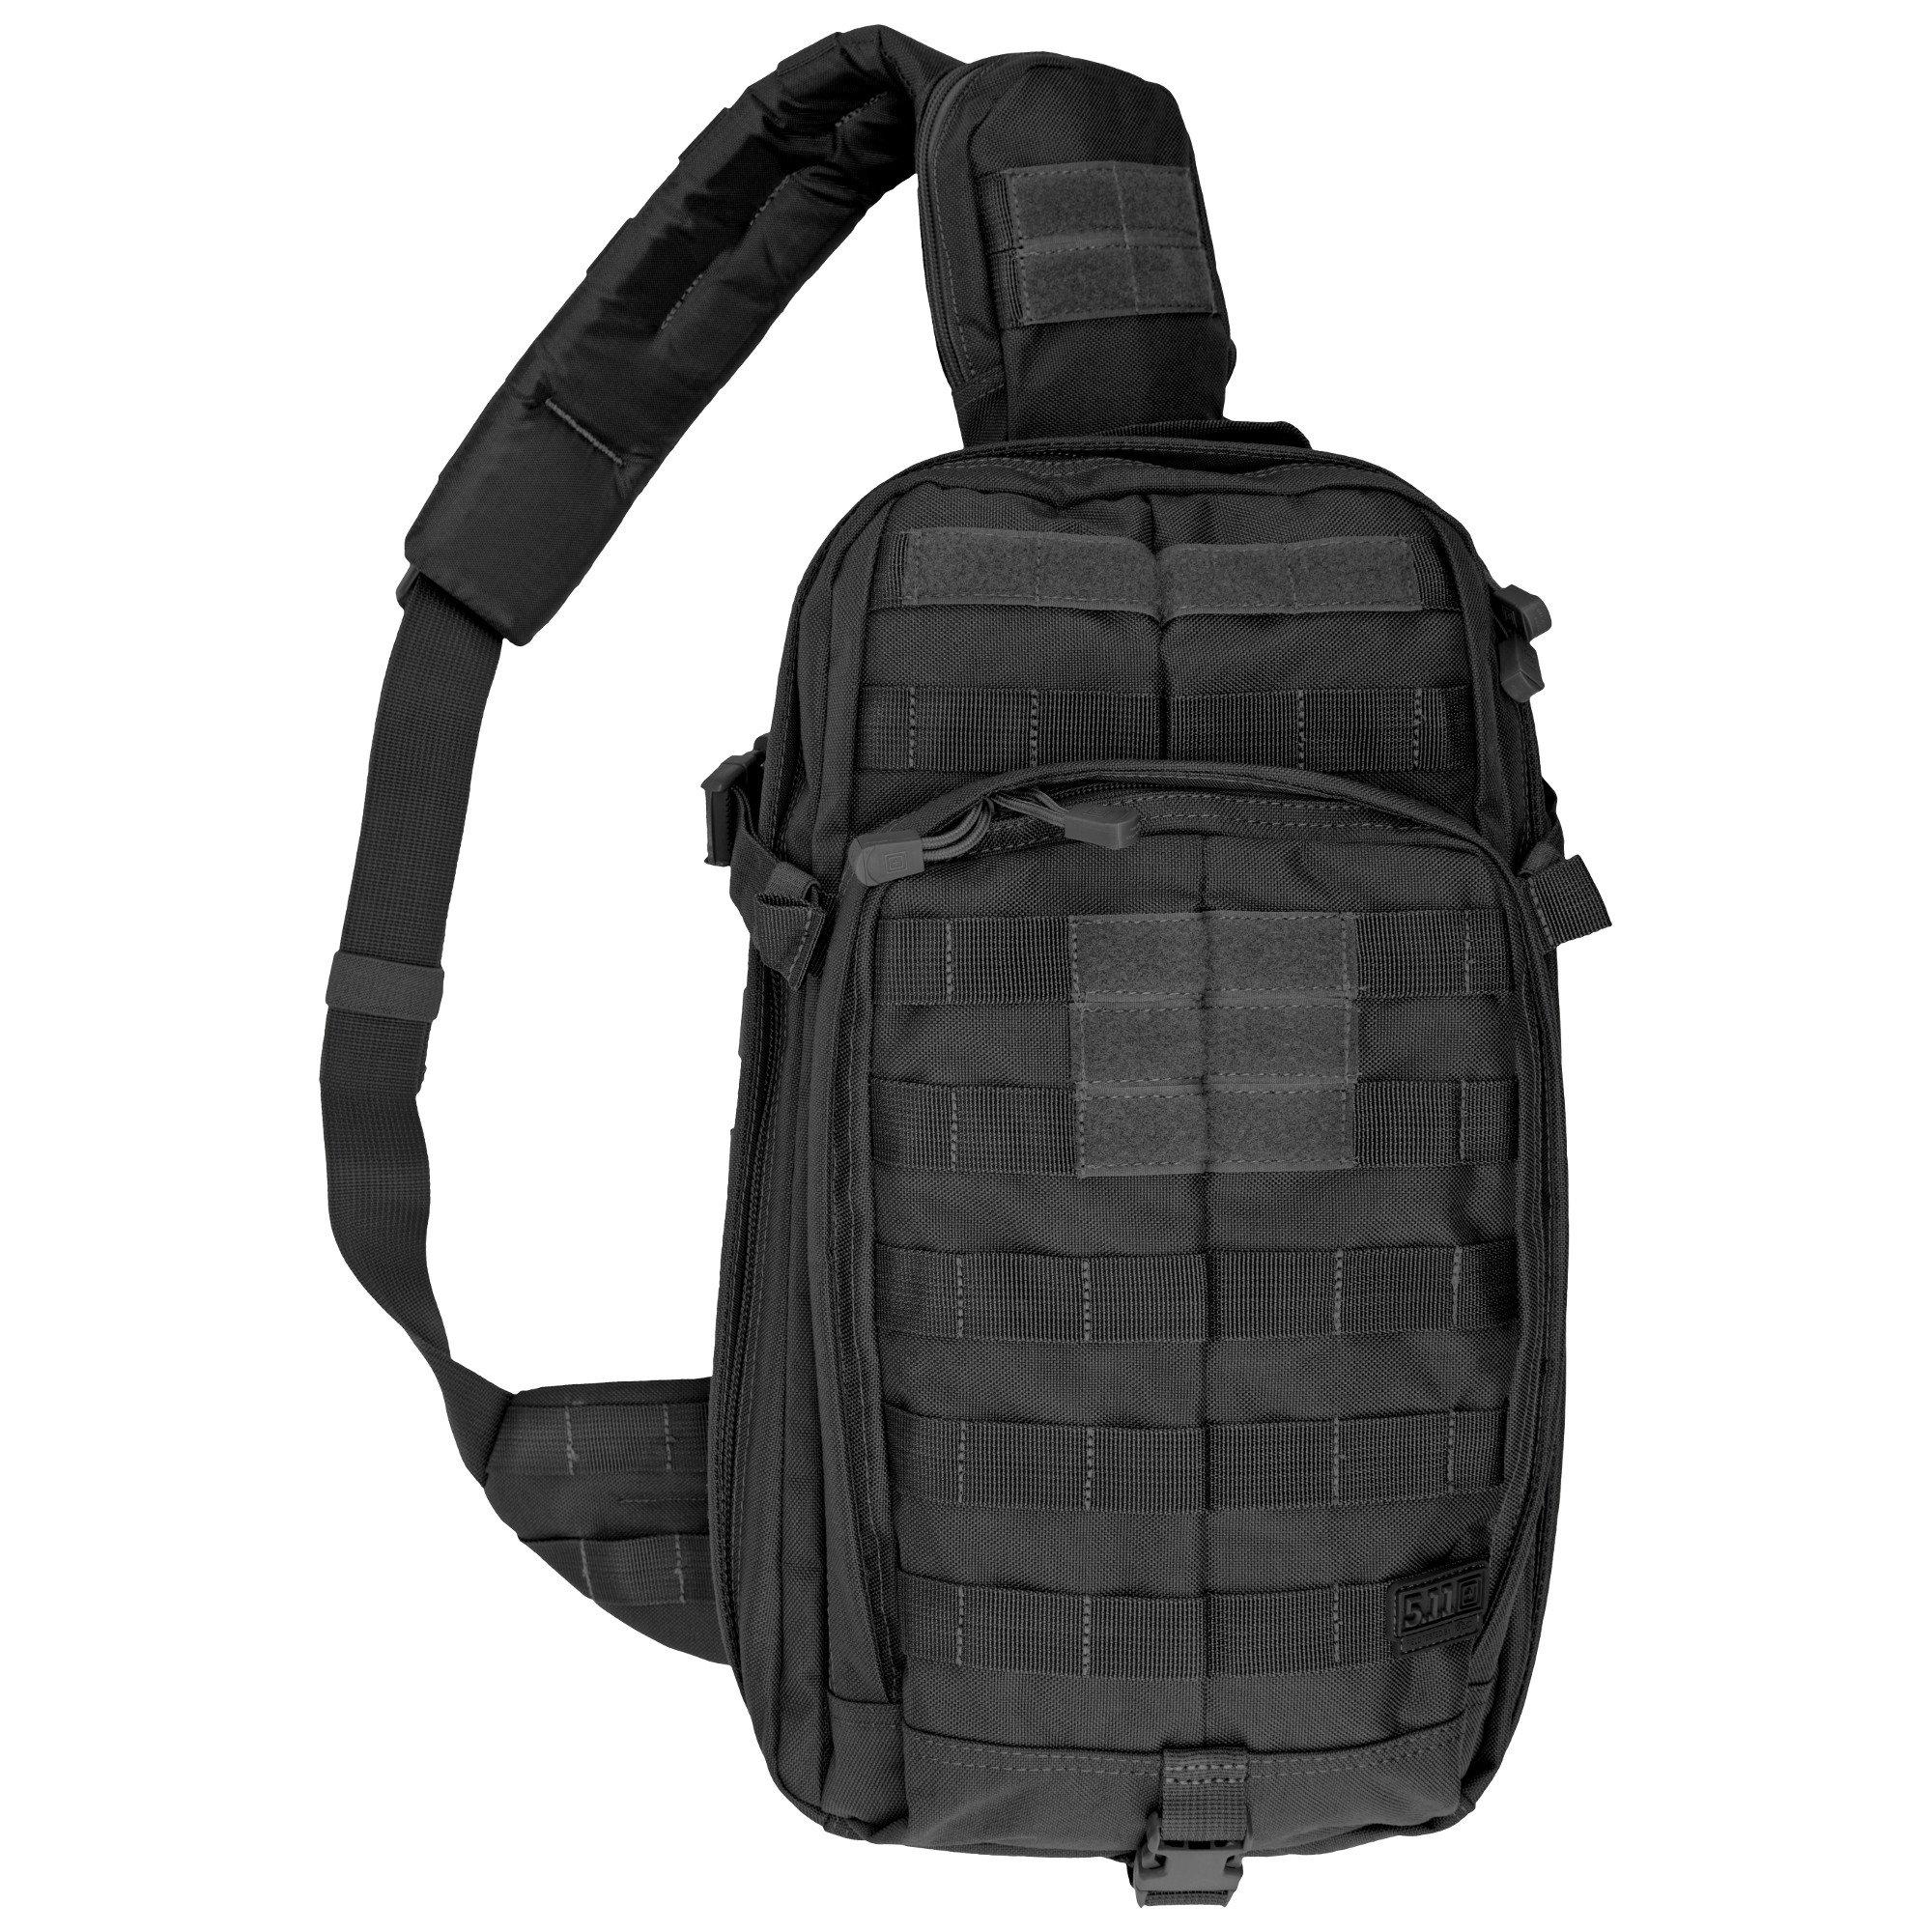 Balo 1 Quai 5.11 Tactical Moab 10 – Black